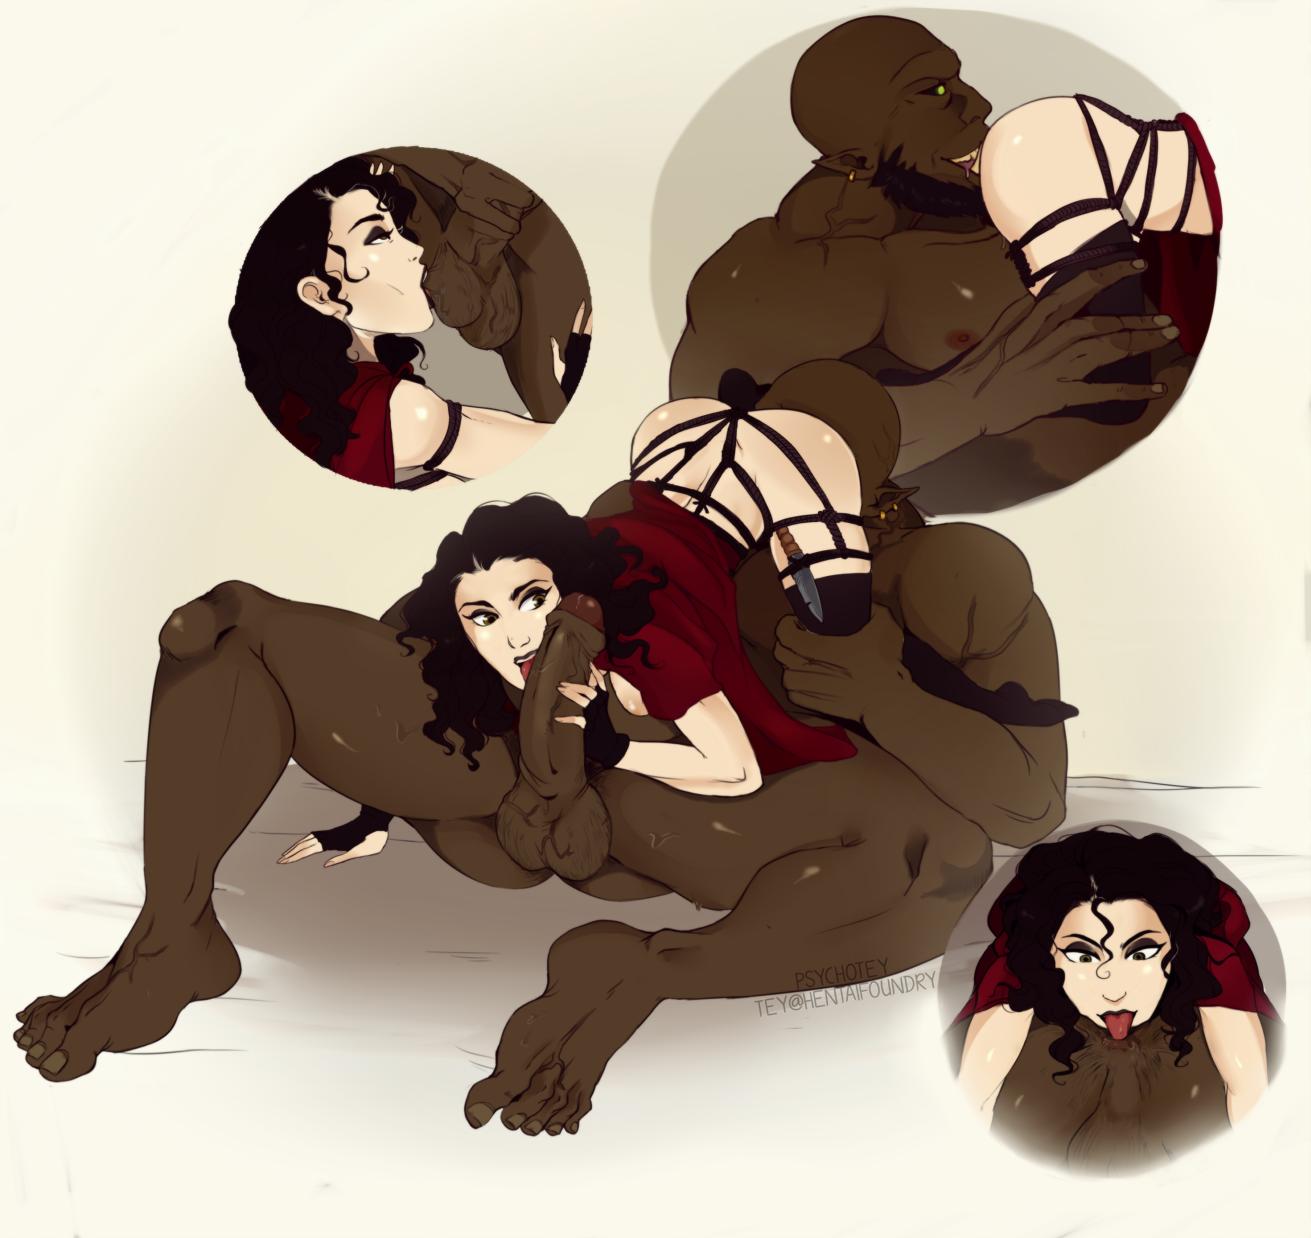 Gorgo and Huntress